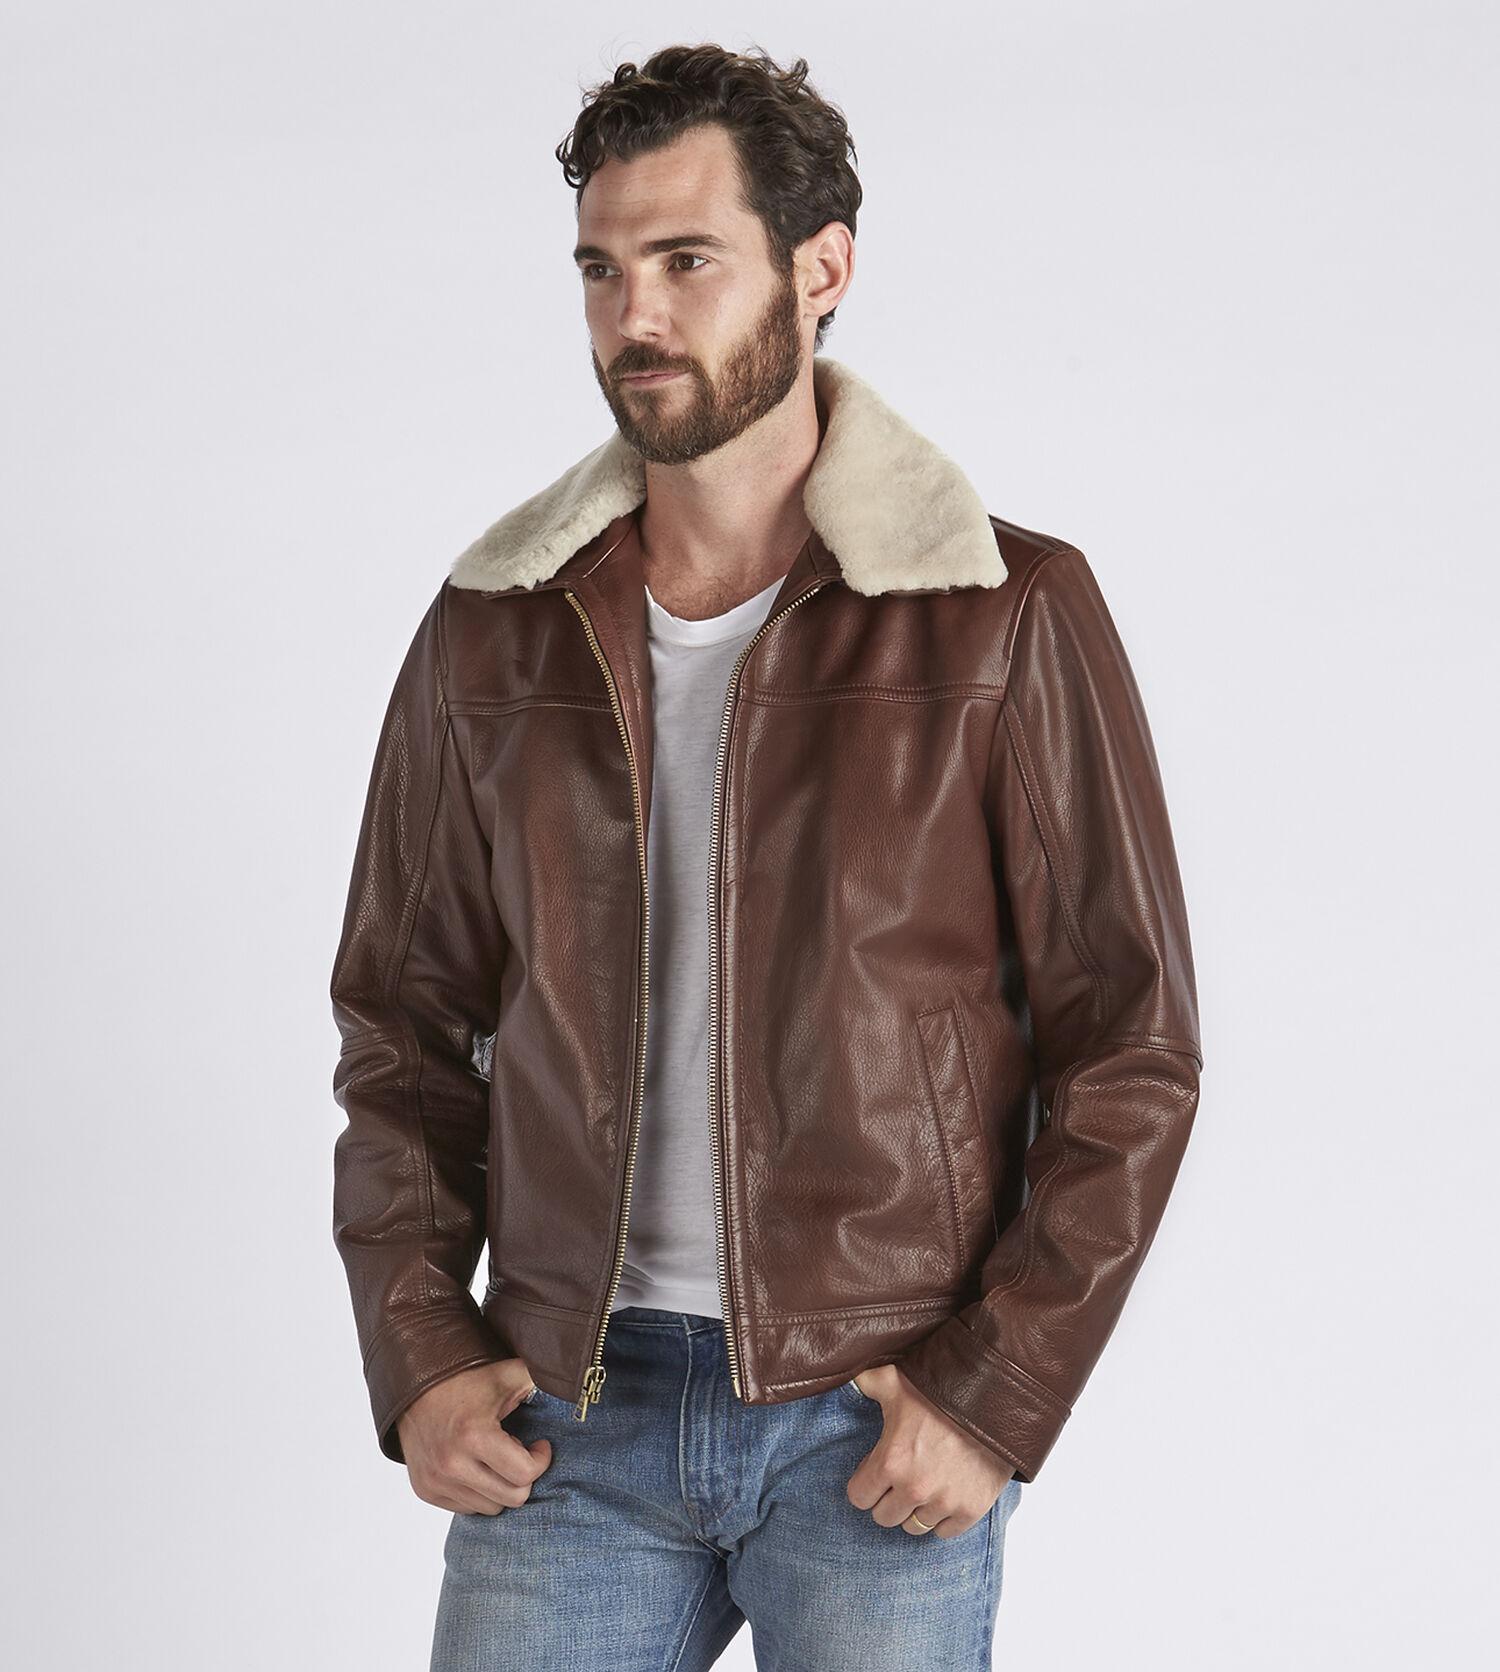 Aviatrix mens leather jacket